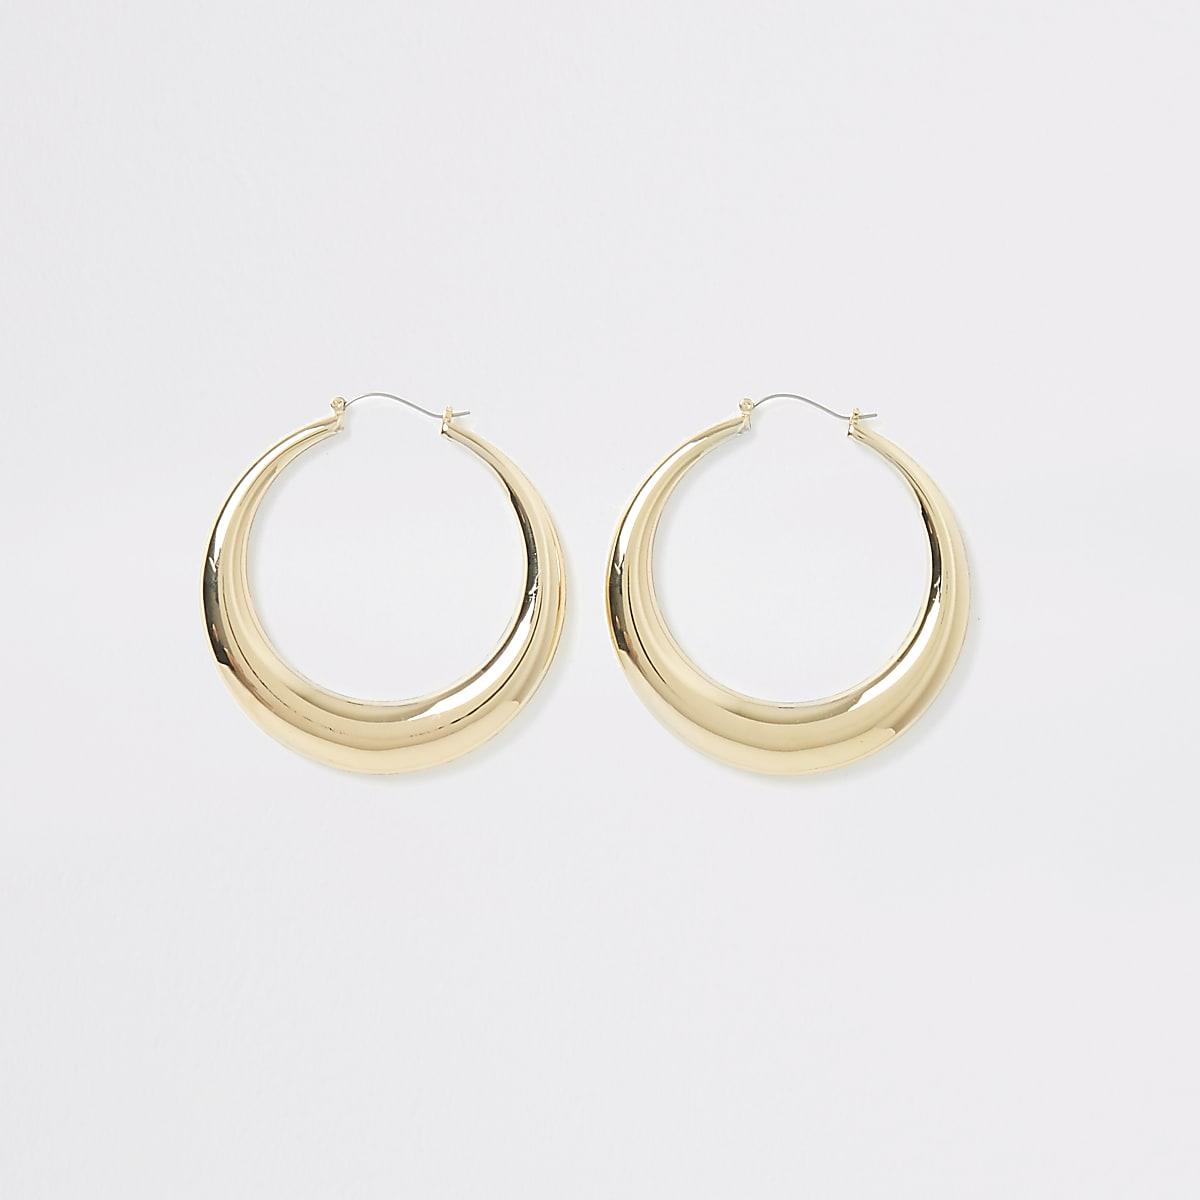 Gold color statement hoop earrings